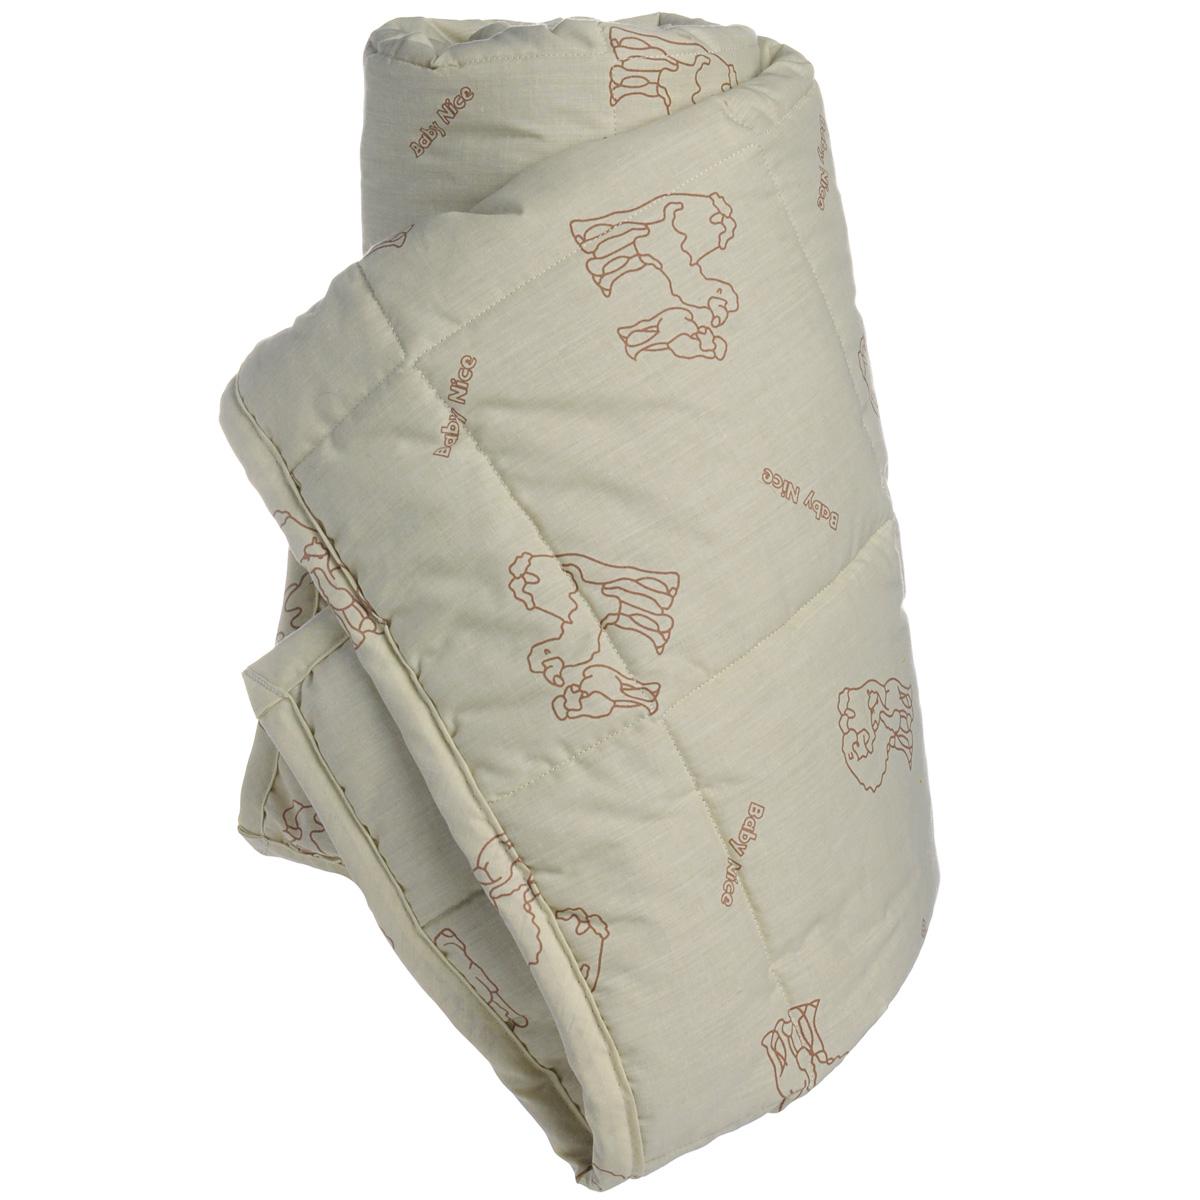 Одеяло детское Baby Nice, стеганое, цвет: бежевый, 105 см x 140 см. Wa57085Wa57085